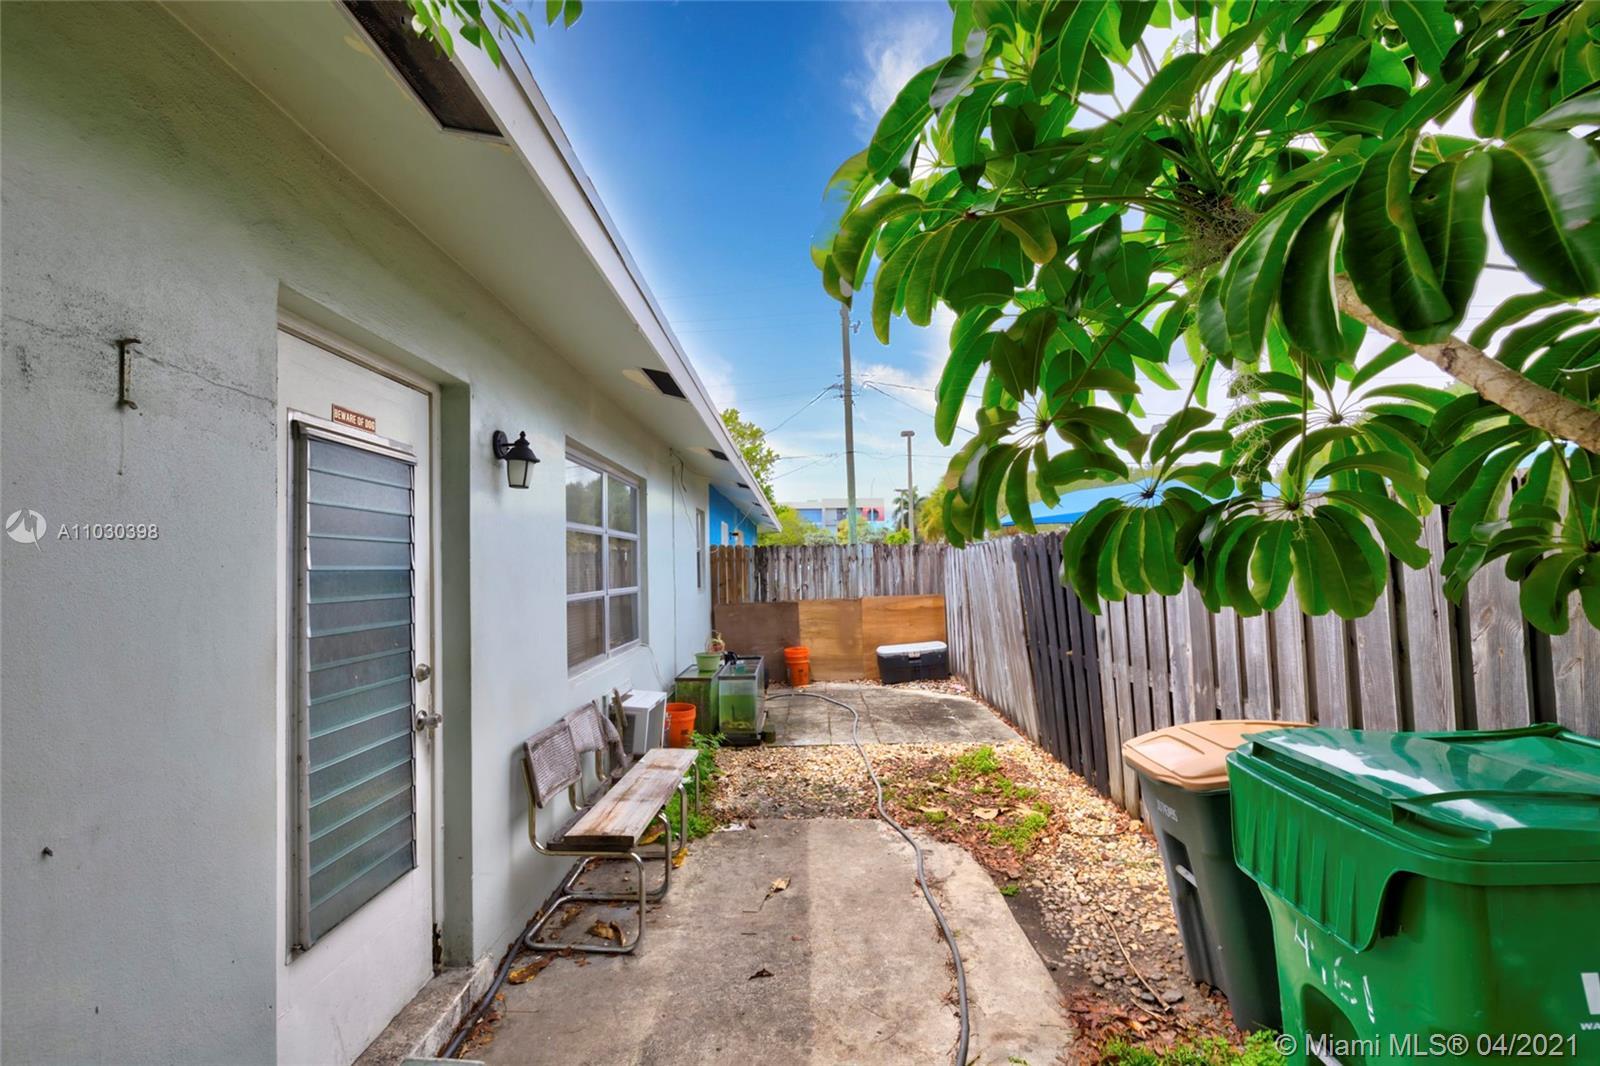 /  2760 sq. ft. $ 2021-04-20 0 Photo